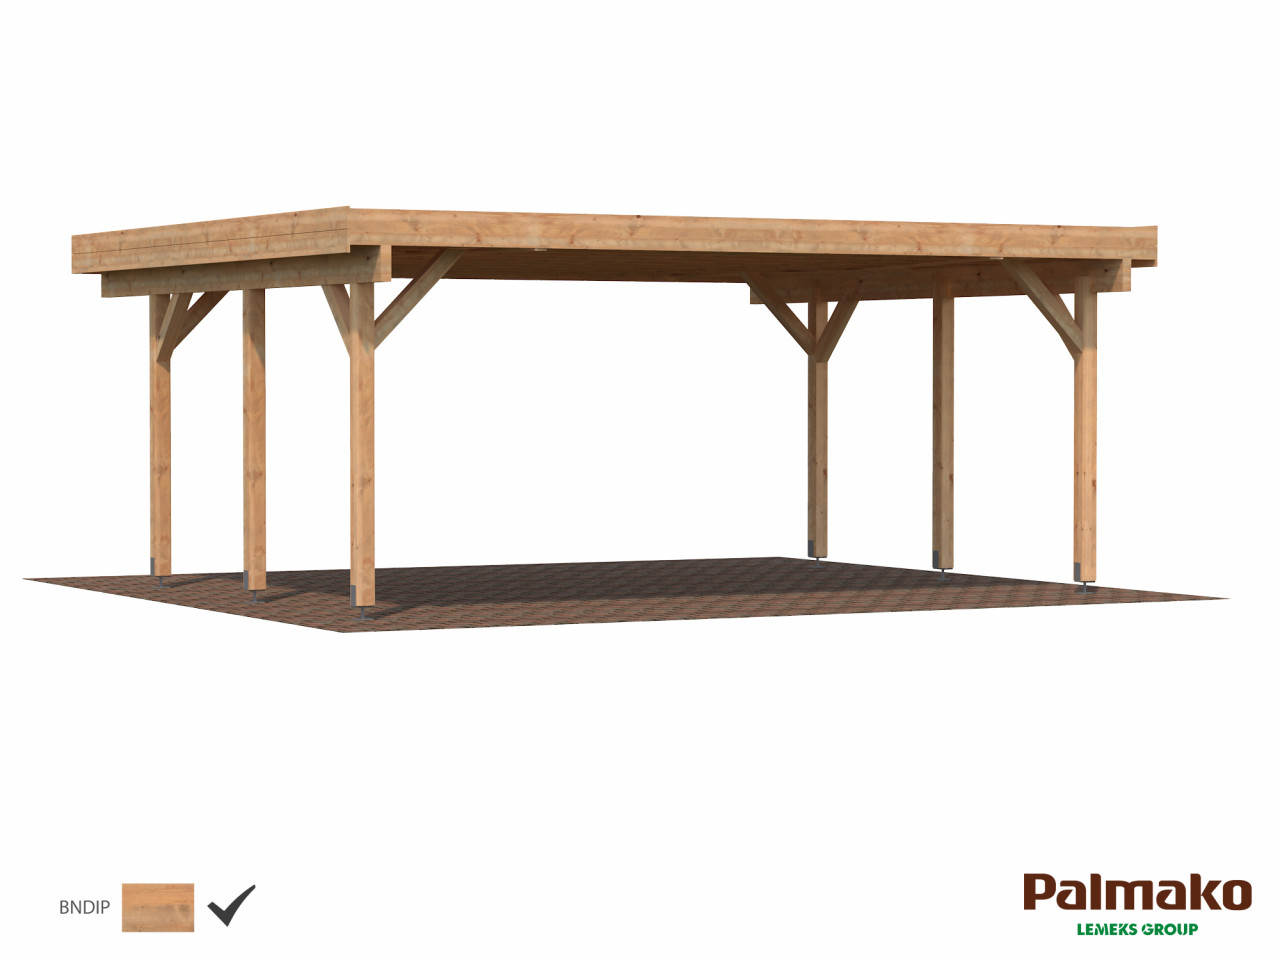 Palmako Holzcarport Karl 20,6 m²